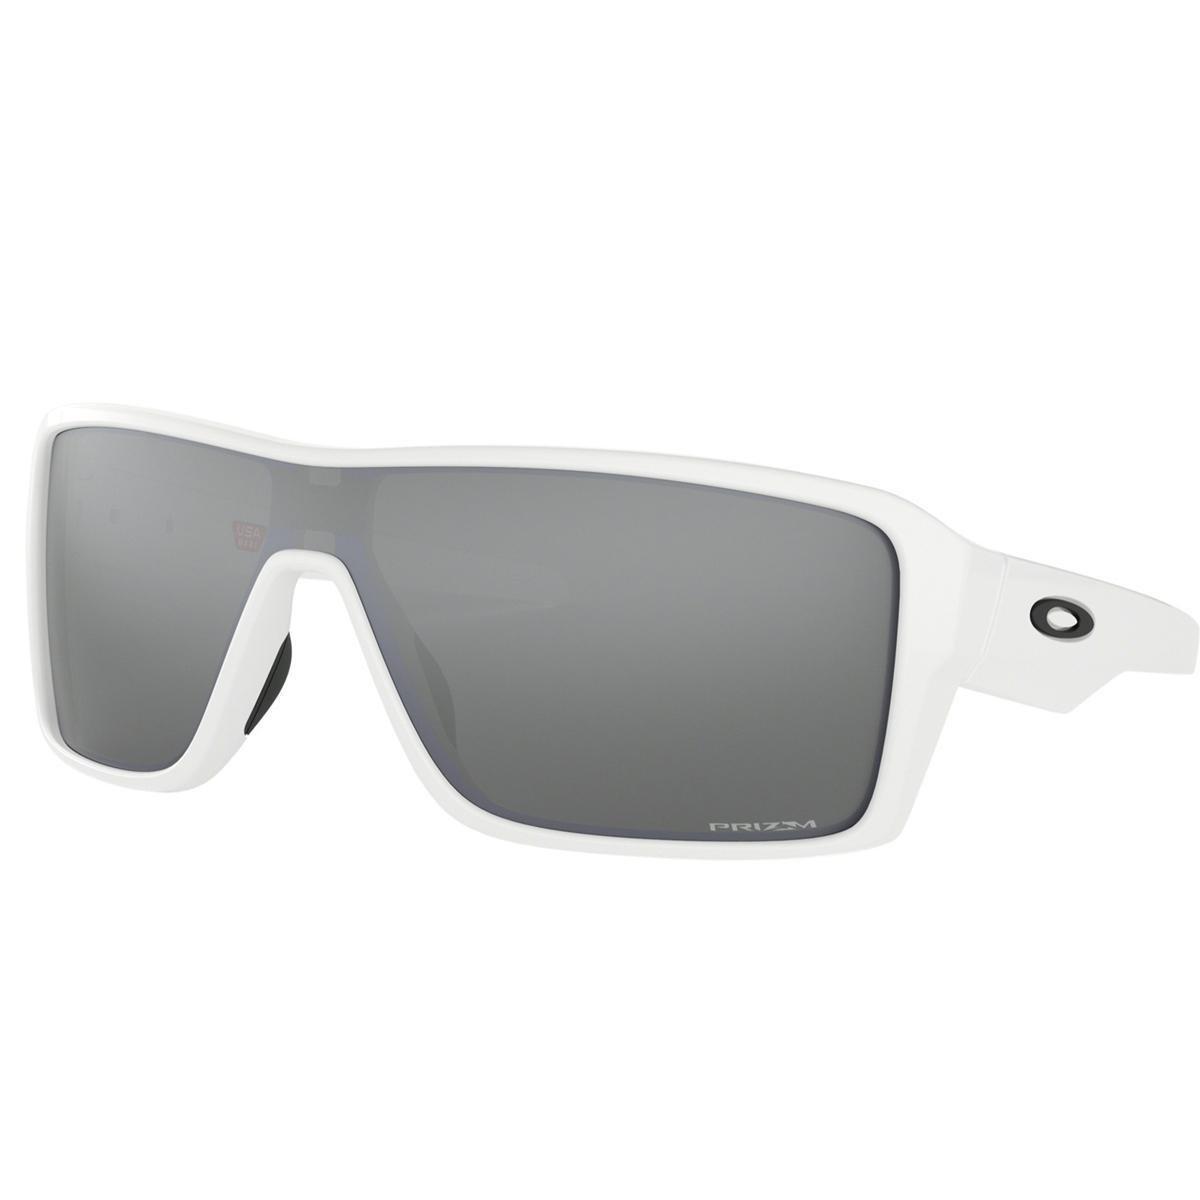 aefd5019b8b68 Óculos Oakley Ridgeline Polished White Lente Prizm Black Iridium - Branco - Compre  Agora